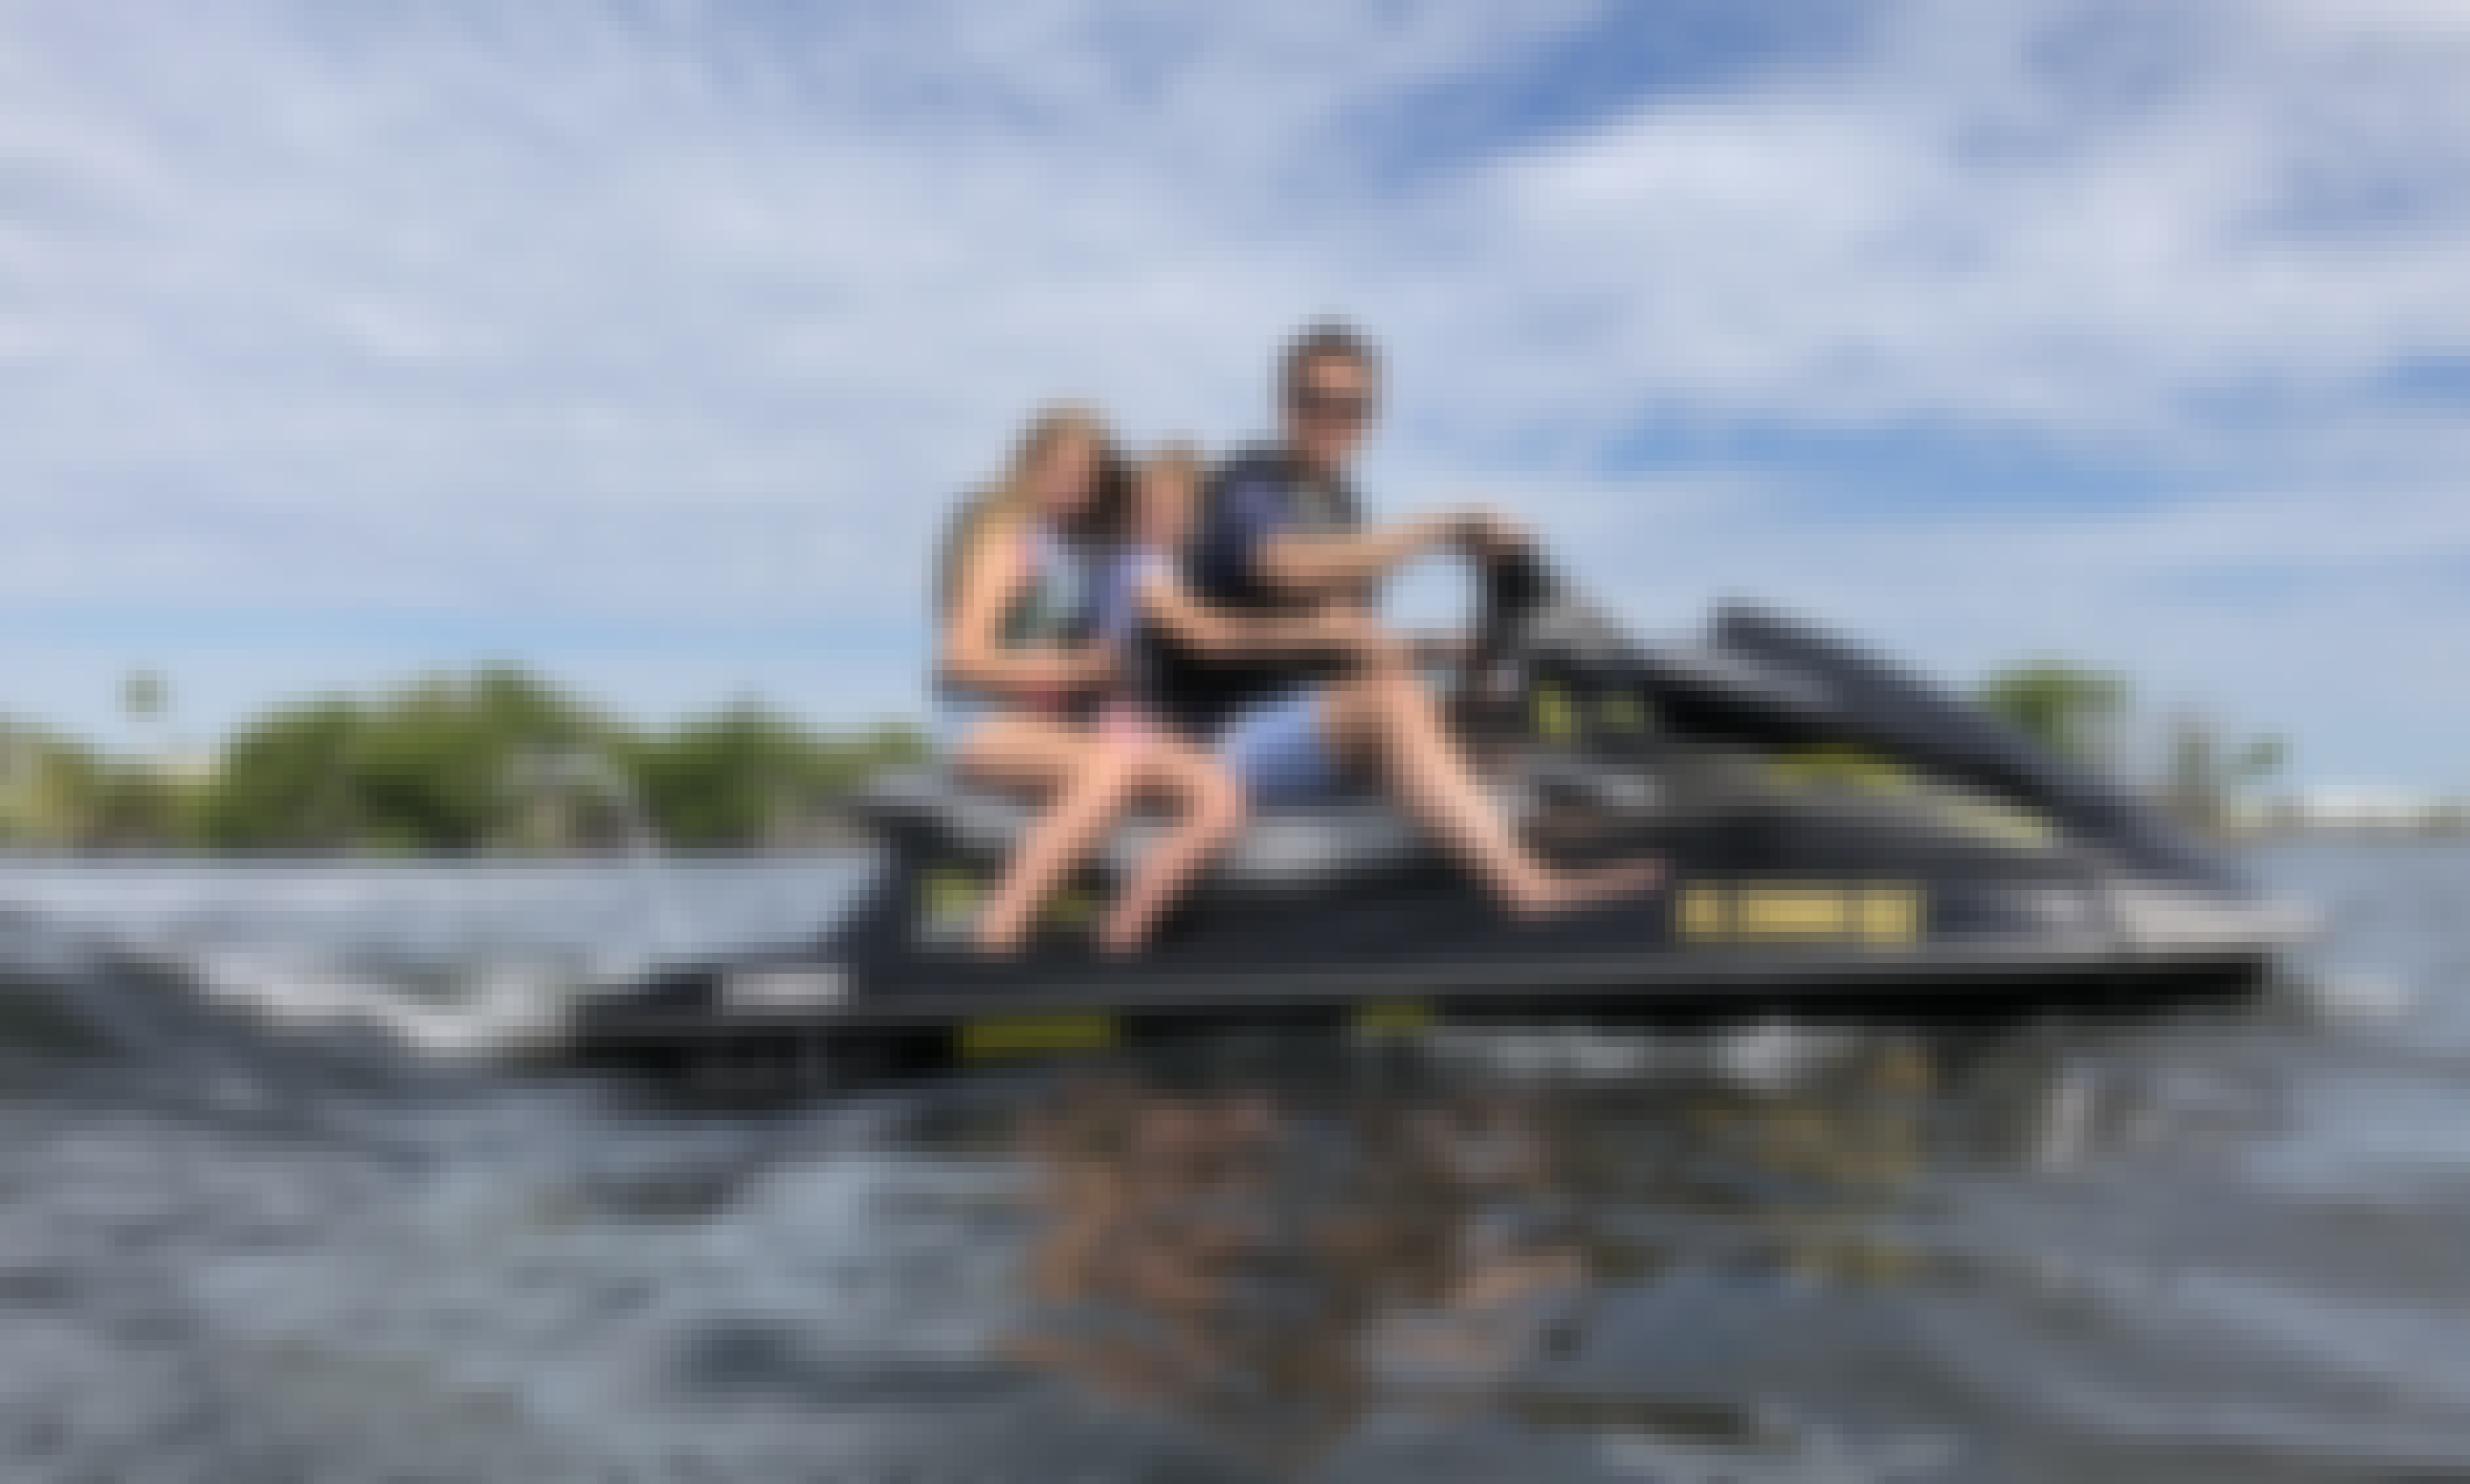 Yamaha Jet Ski/Waverunner Rental In Key Largo